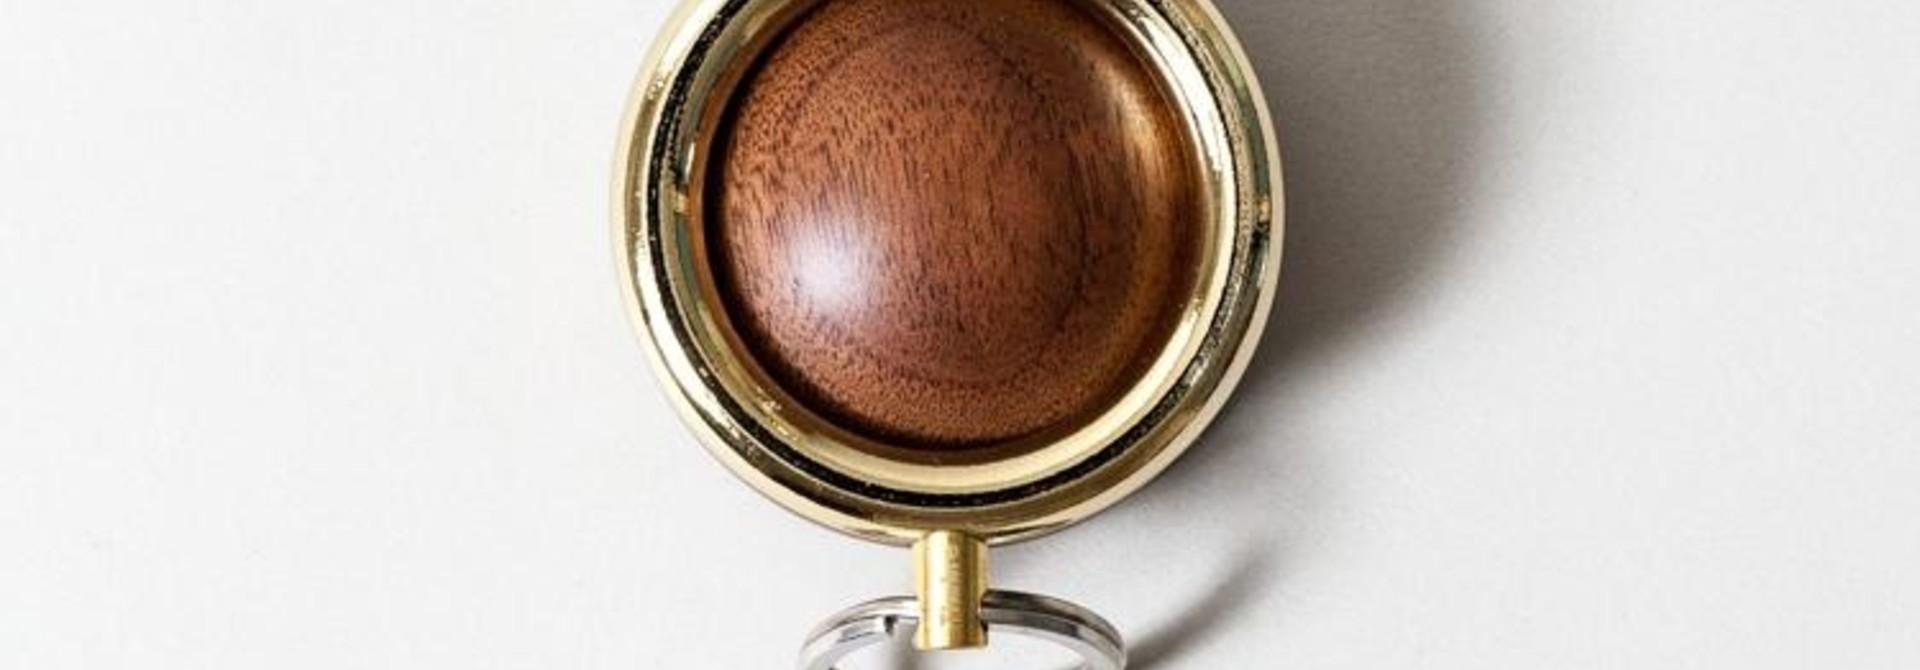 Timbre WAKKA Key Holder - Gold/Walnut